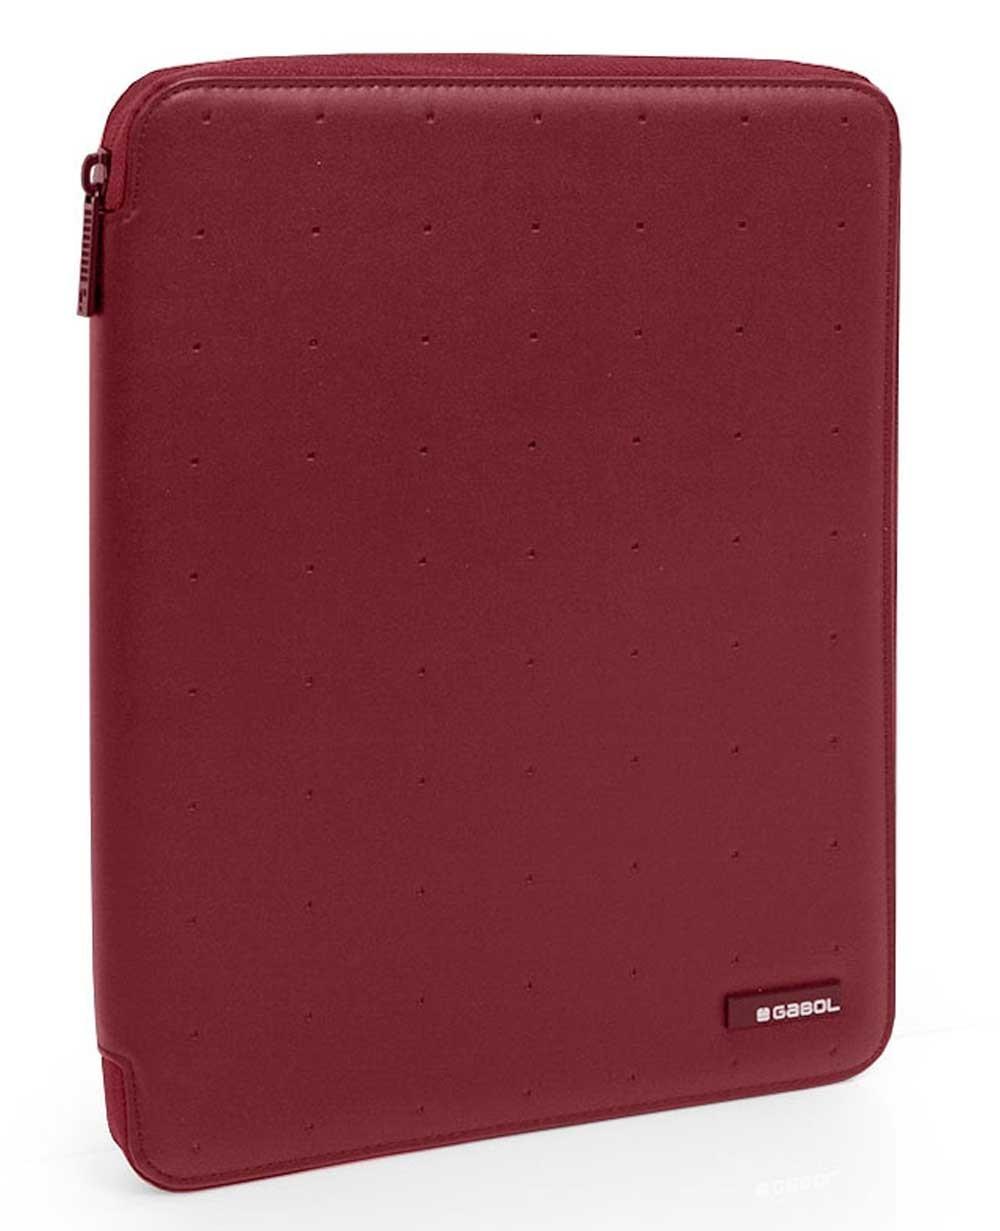 "Gabol Alpha 13.3"" Portafolio A4 tablet Rojo (Foto )"